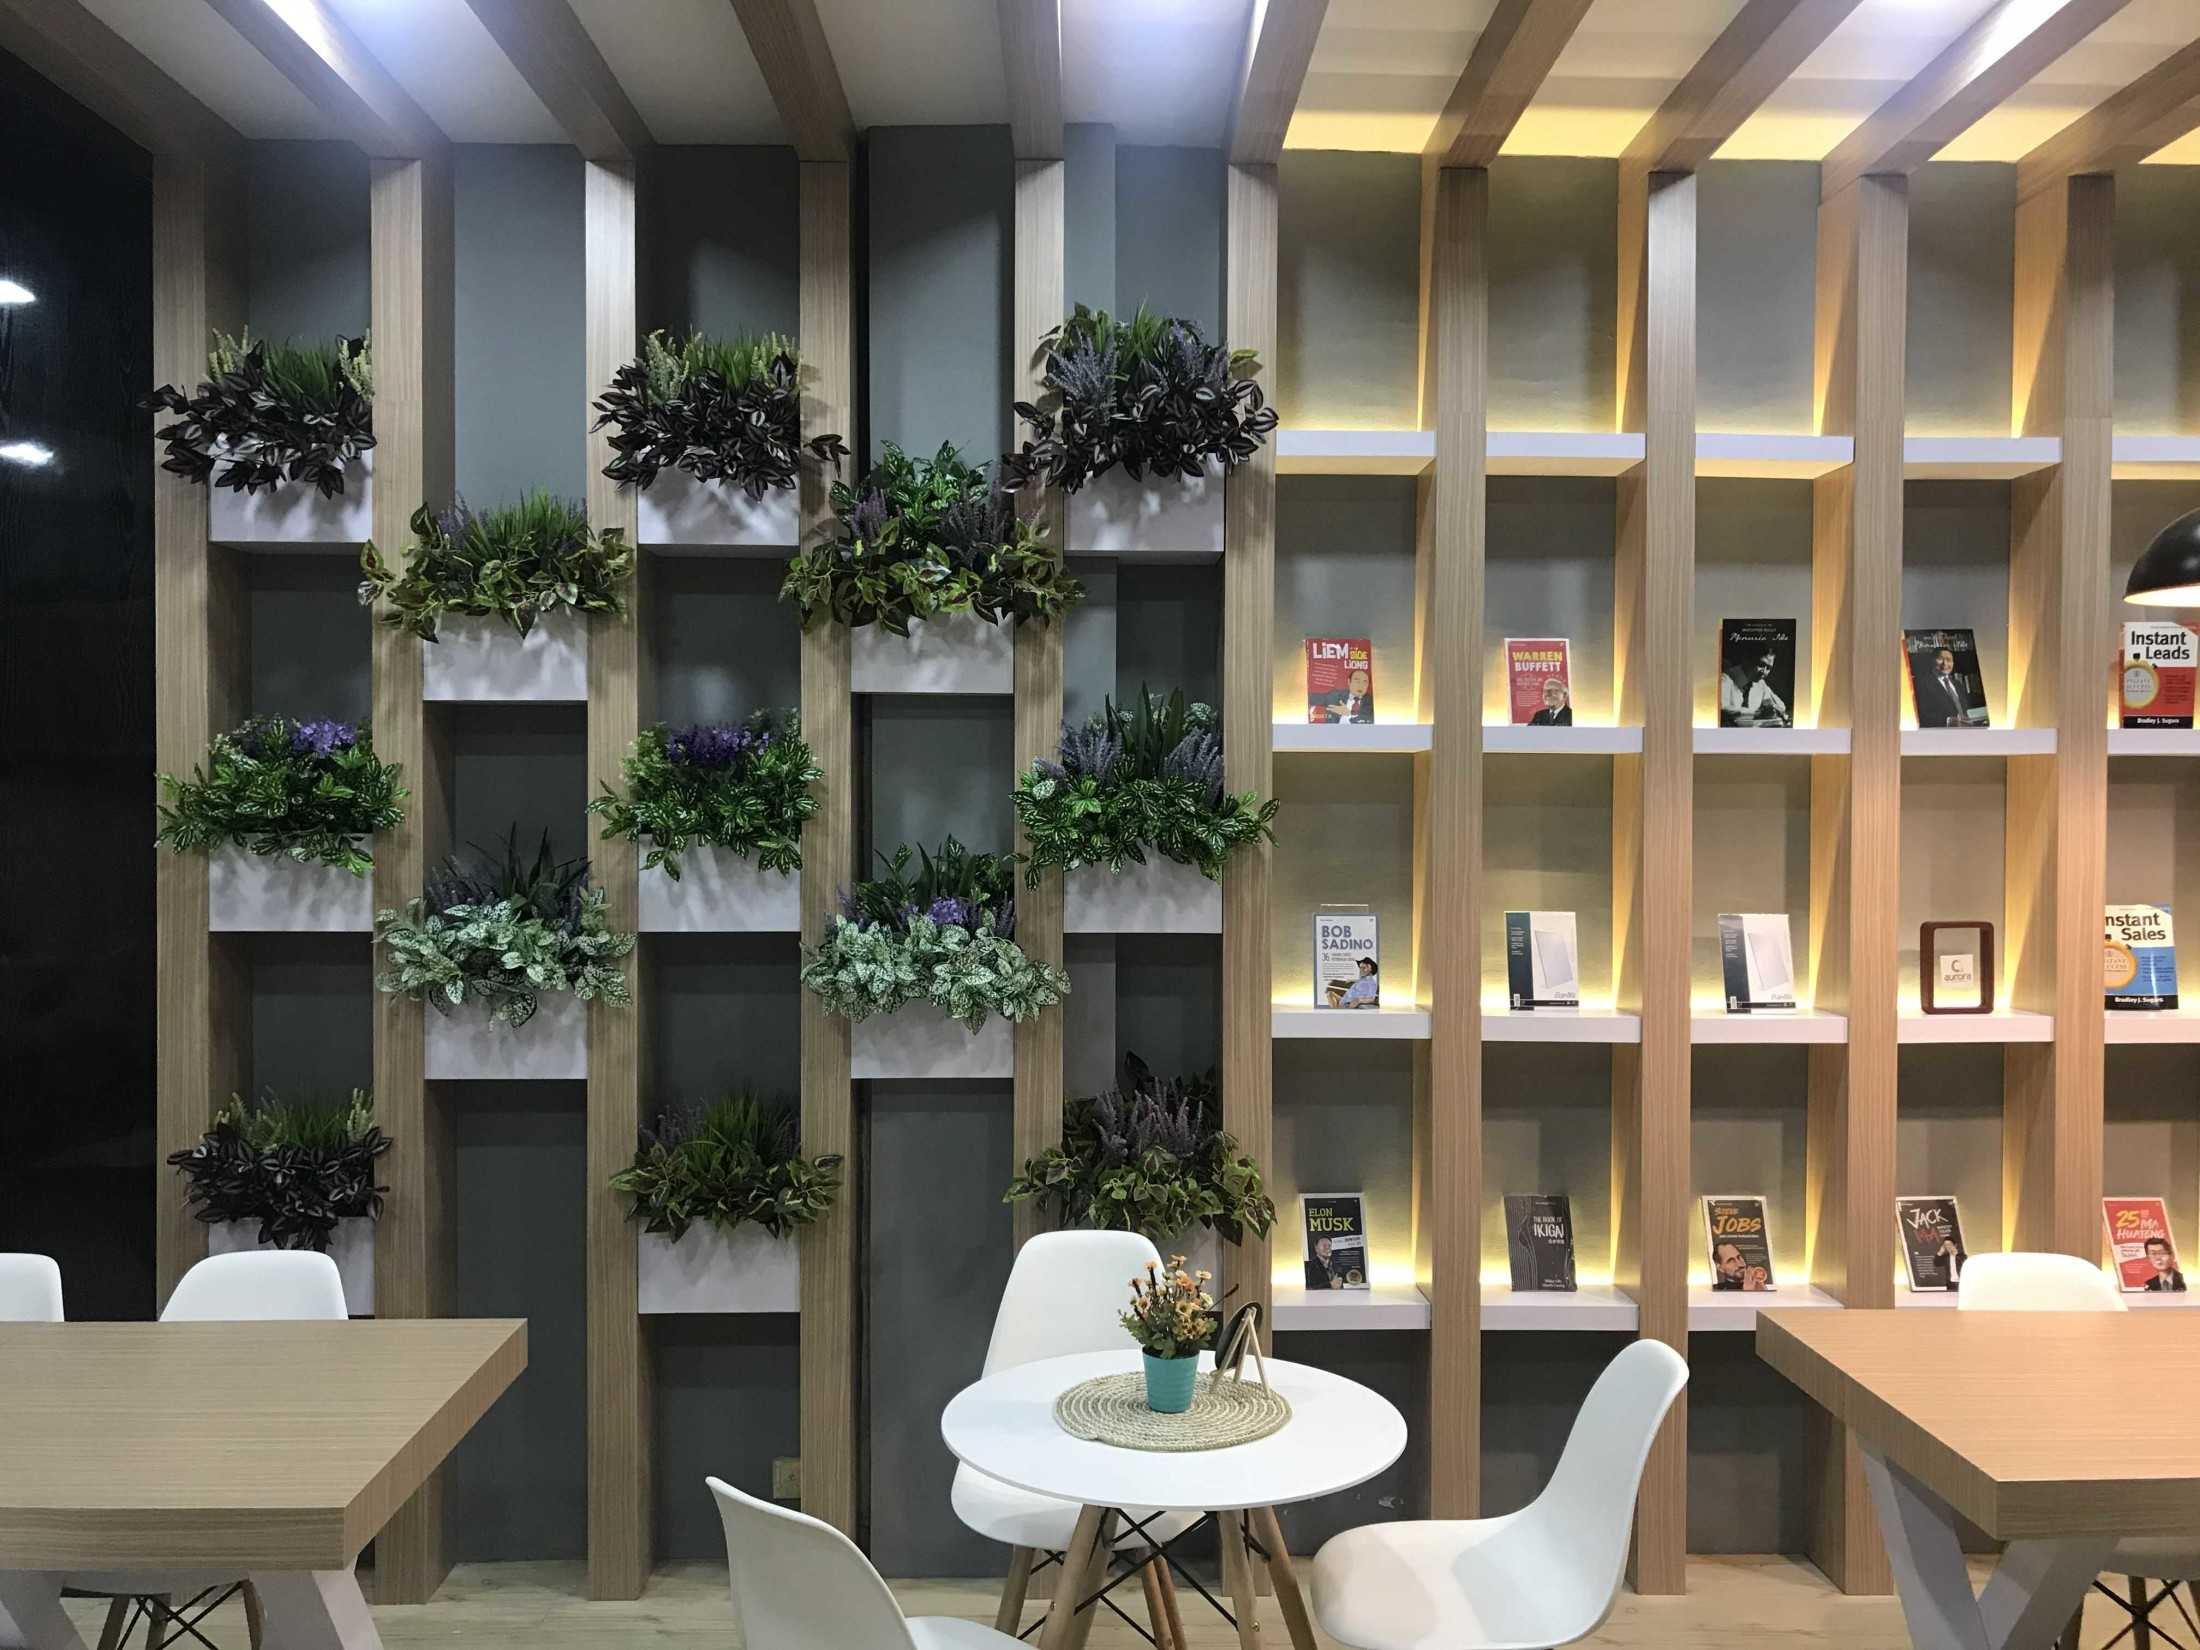 Ada Design Studio Office Plus Jl. Tj. Duren Timur 2 No.40-75, Rt.12/rw.1, Tj. Duren Sel., Grogol Petamburan, Kota Jakarta Barat, Daerah Khusus Ibukota Jakarta 11470, Indonesia Jl. Tj. Duren Timur 2 No.40-75, Rt.12/rw.1, Tj. Duren Sel., Grogol Petamburan, Kota Jakarta Barat, Daerah Khusus Ibukota Jakarta 11470, Indonesia Ada-Home-Office-Plus  68985